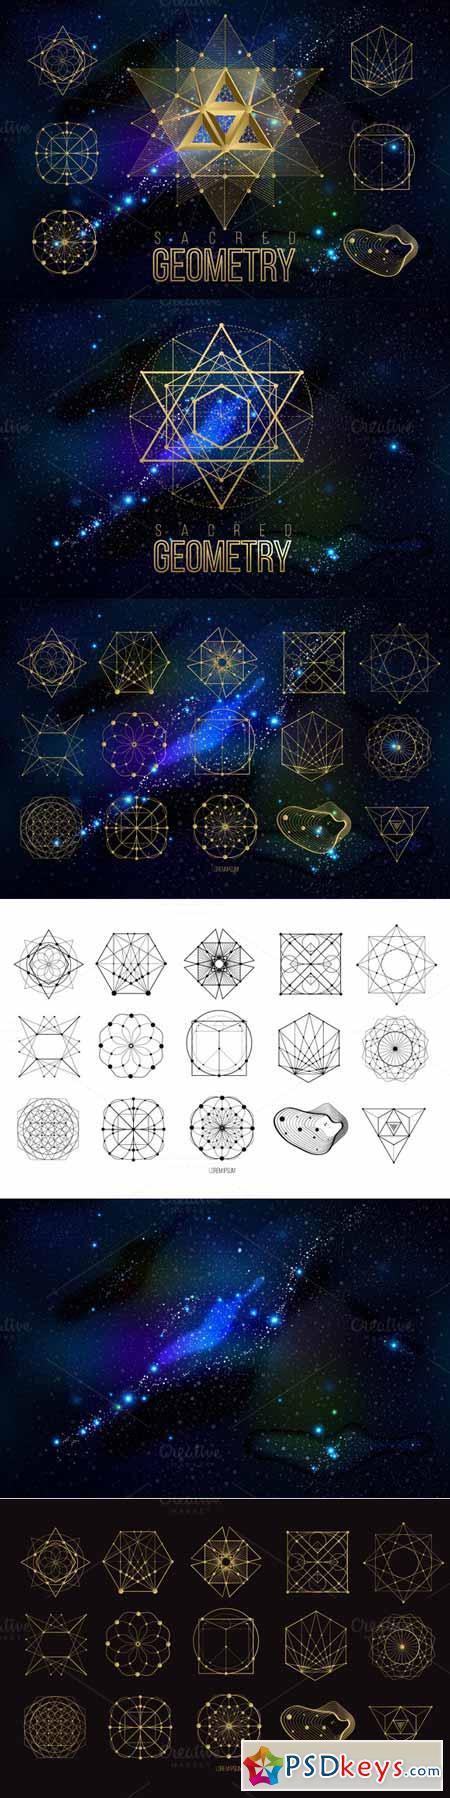 Vector geometry shape 17 574810